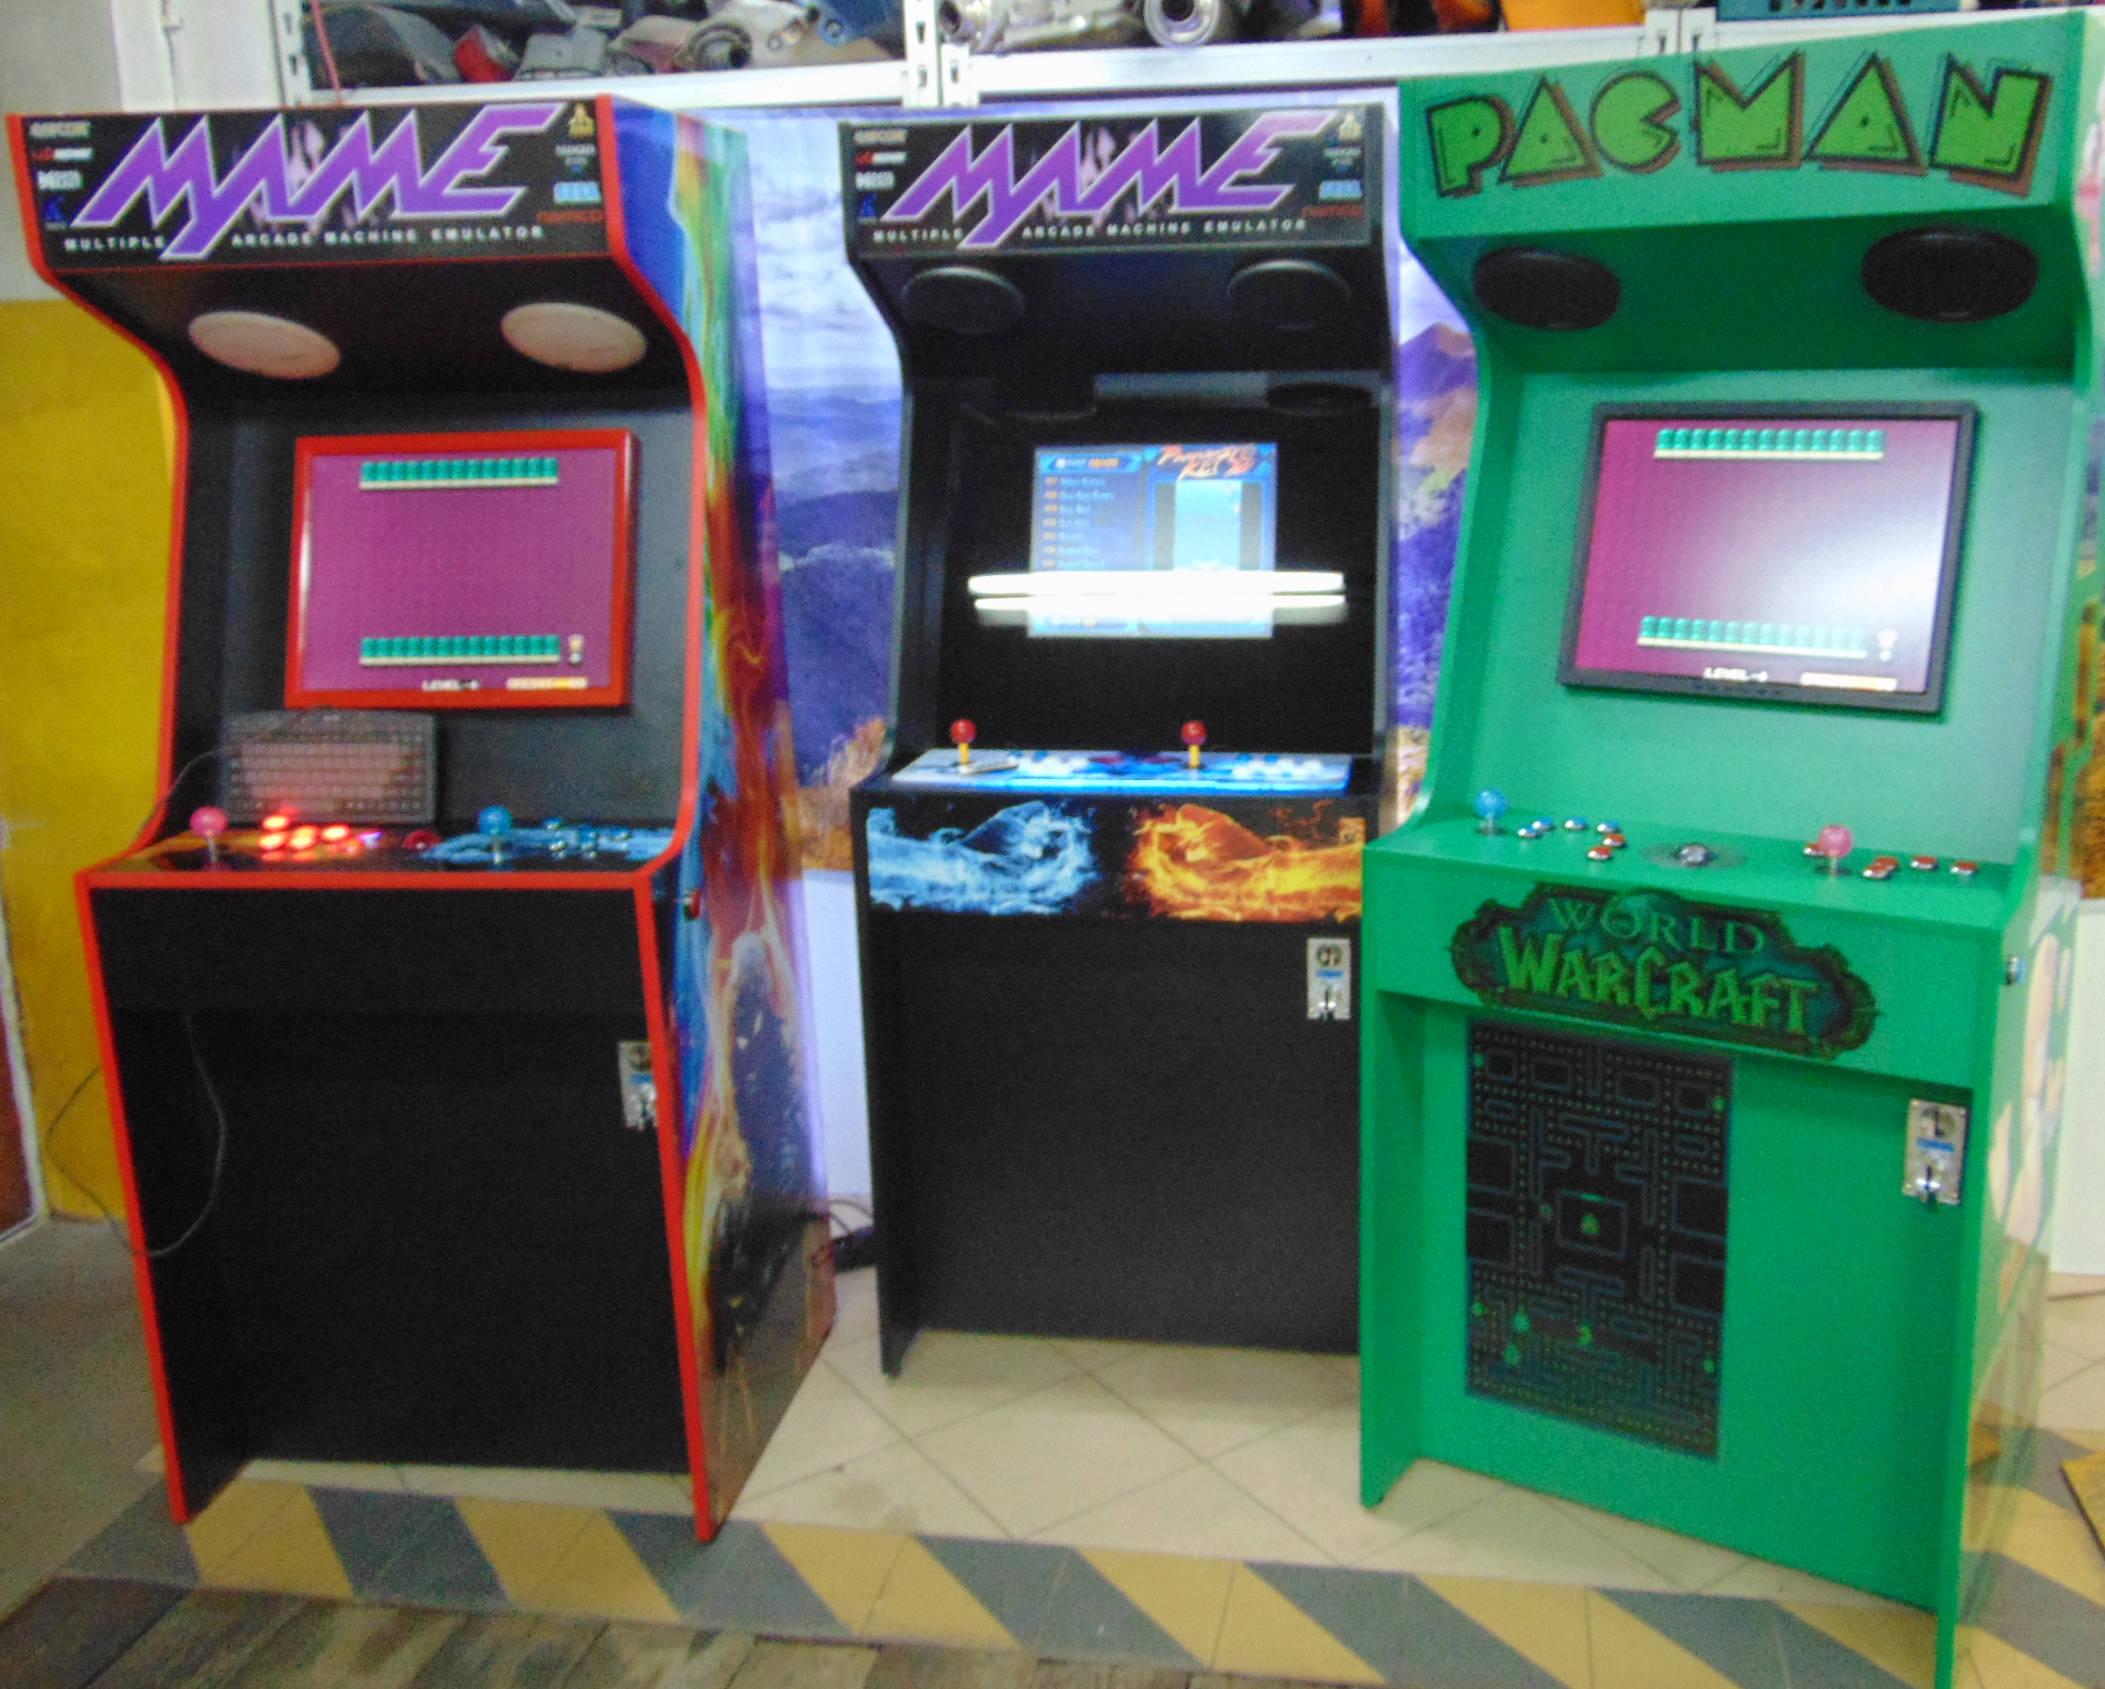 Automat Do Gier Arcade 999 W Jednym Pudle 7242885082 Sklep Internetowy Agd Rtv Telefony Laptopy Allegro Pl